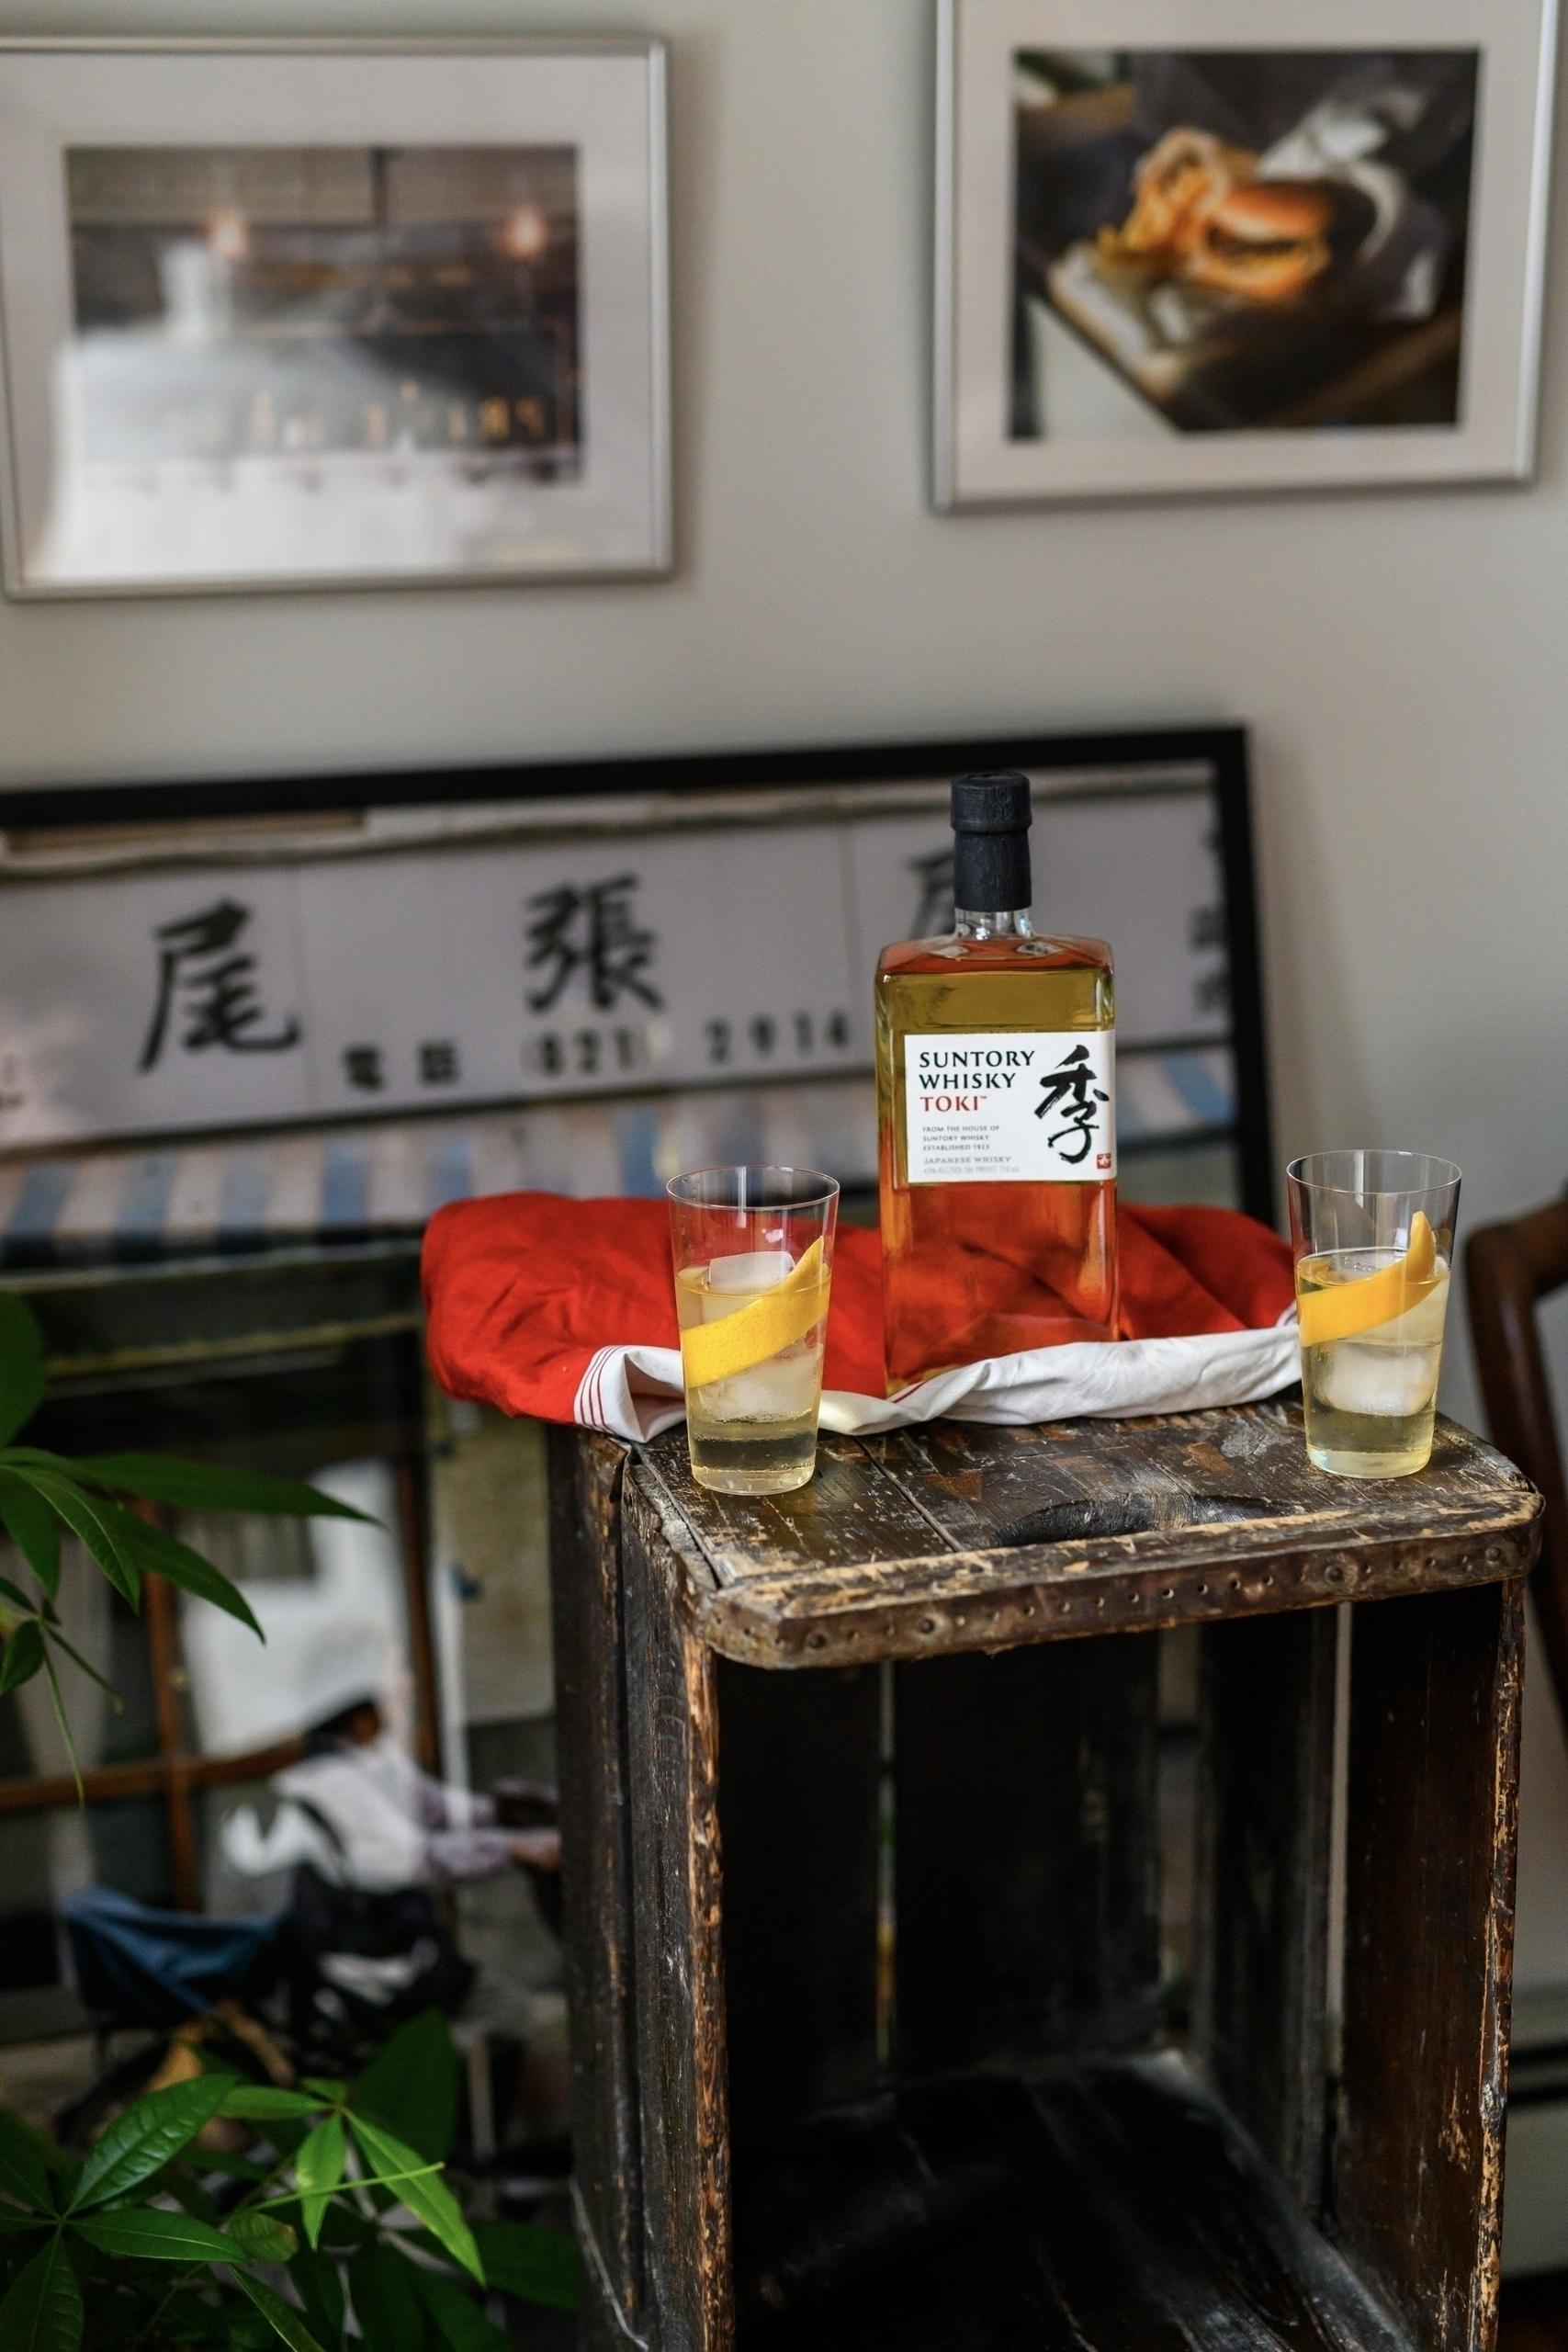 photo-shoot/partnership Suntory - danielkrieger | ello